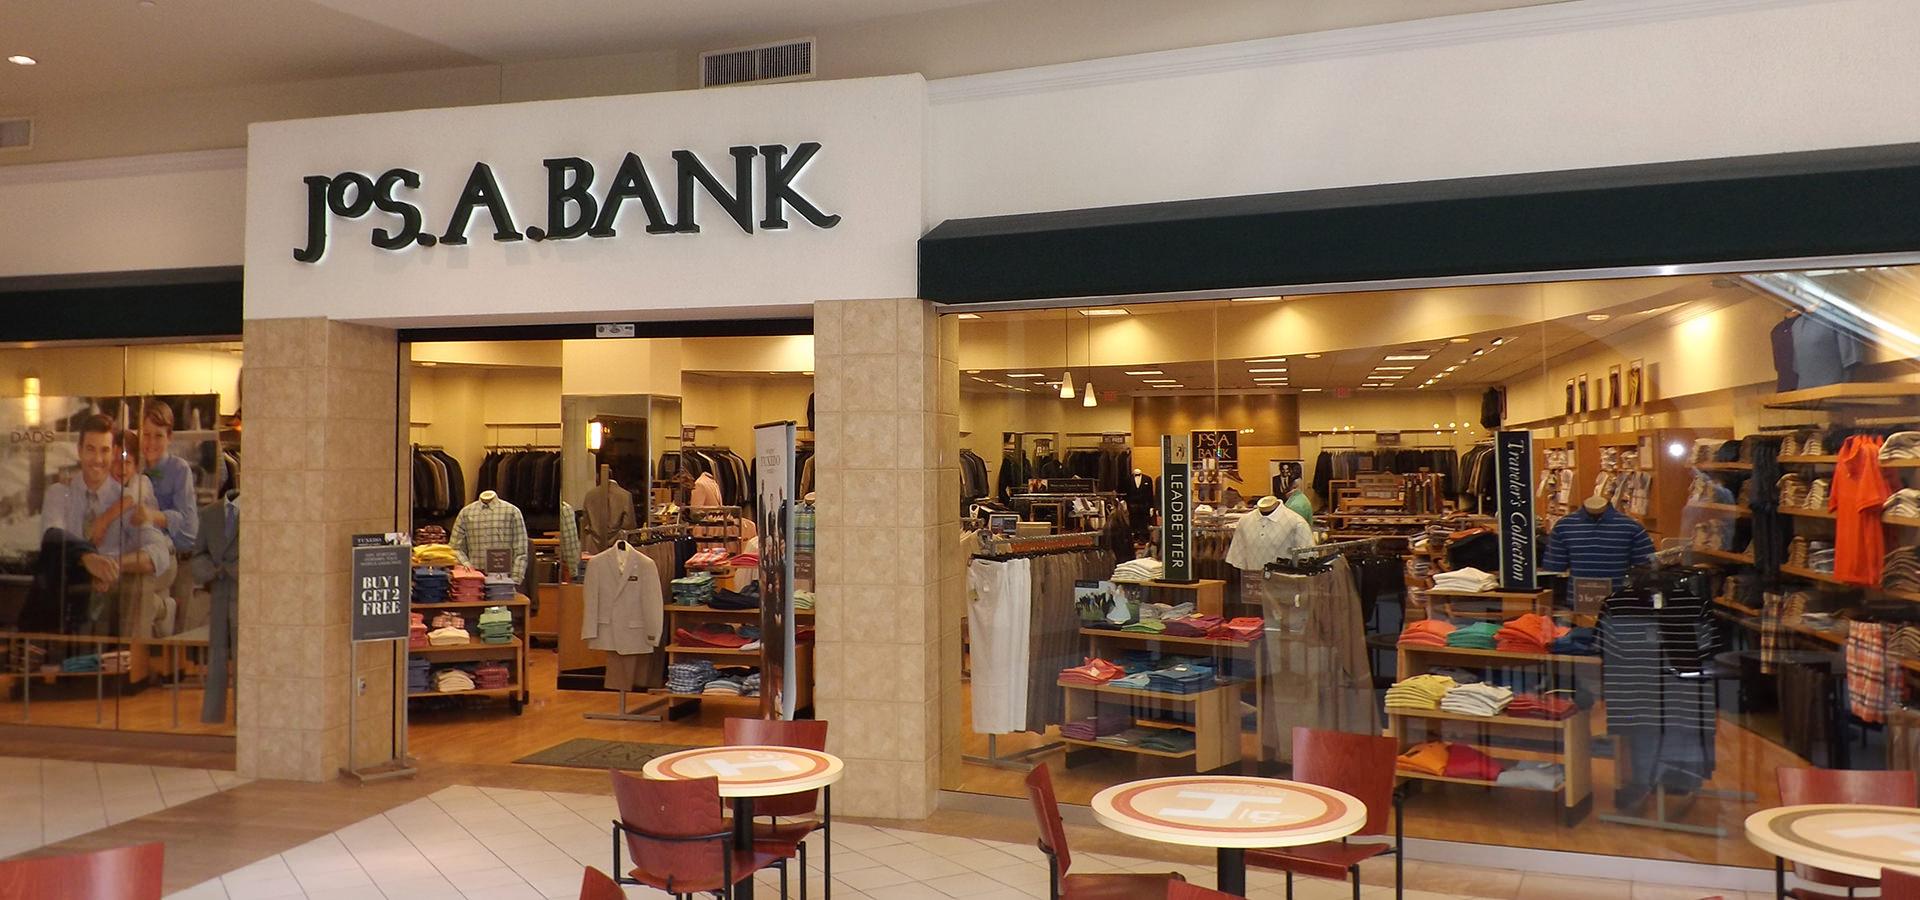 Jos A. Bank; A Treasure Trove Of Suits | LATF USA Joseph A Bank